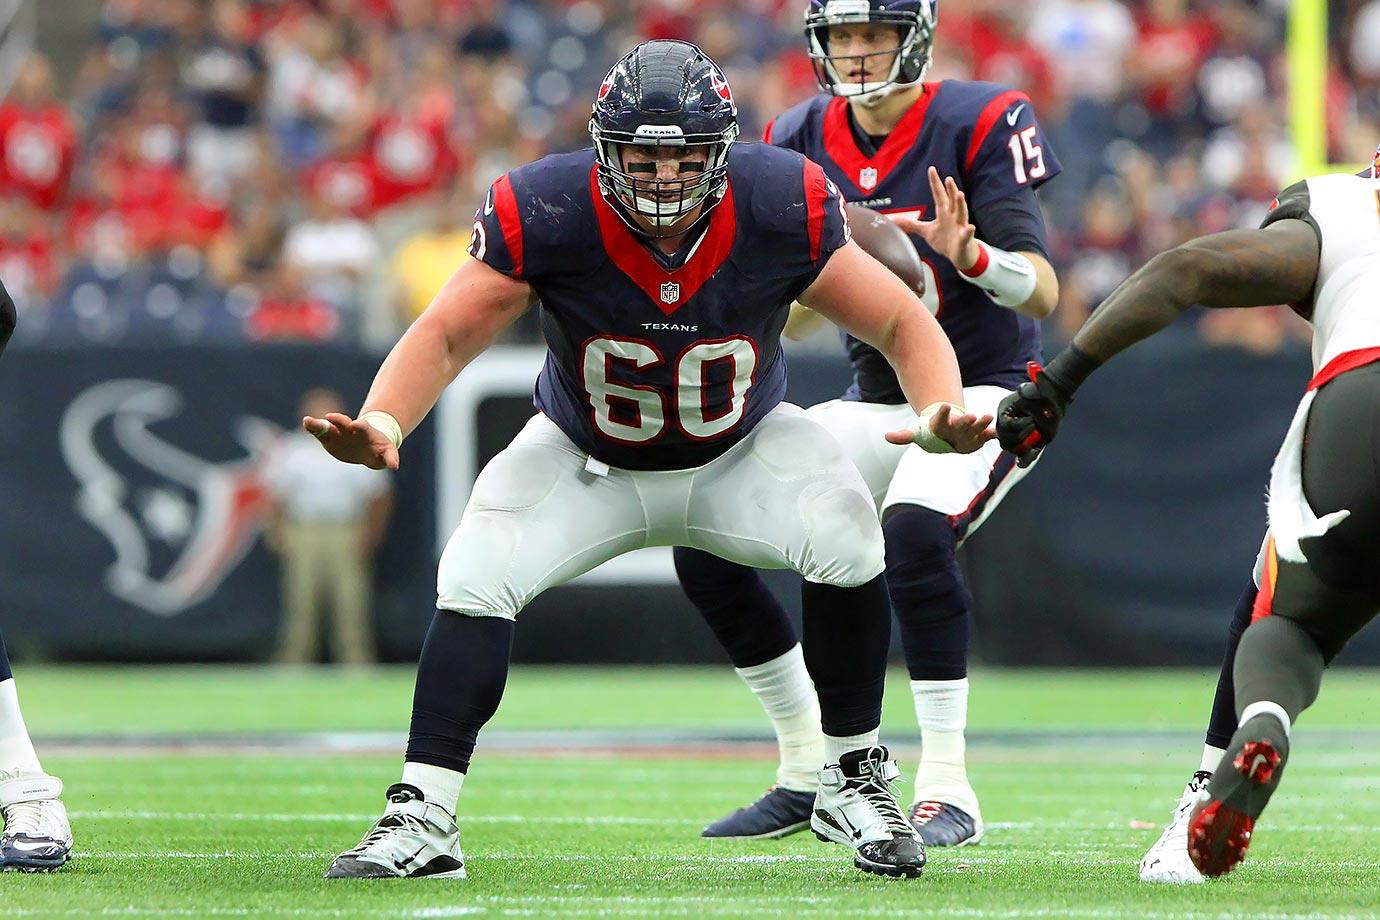 2015 Team: Houston Texans — 2016 Team: Tennessee Titans